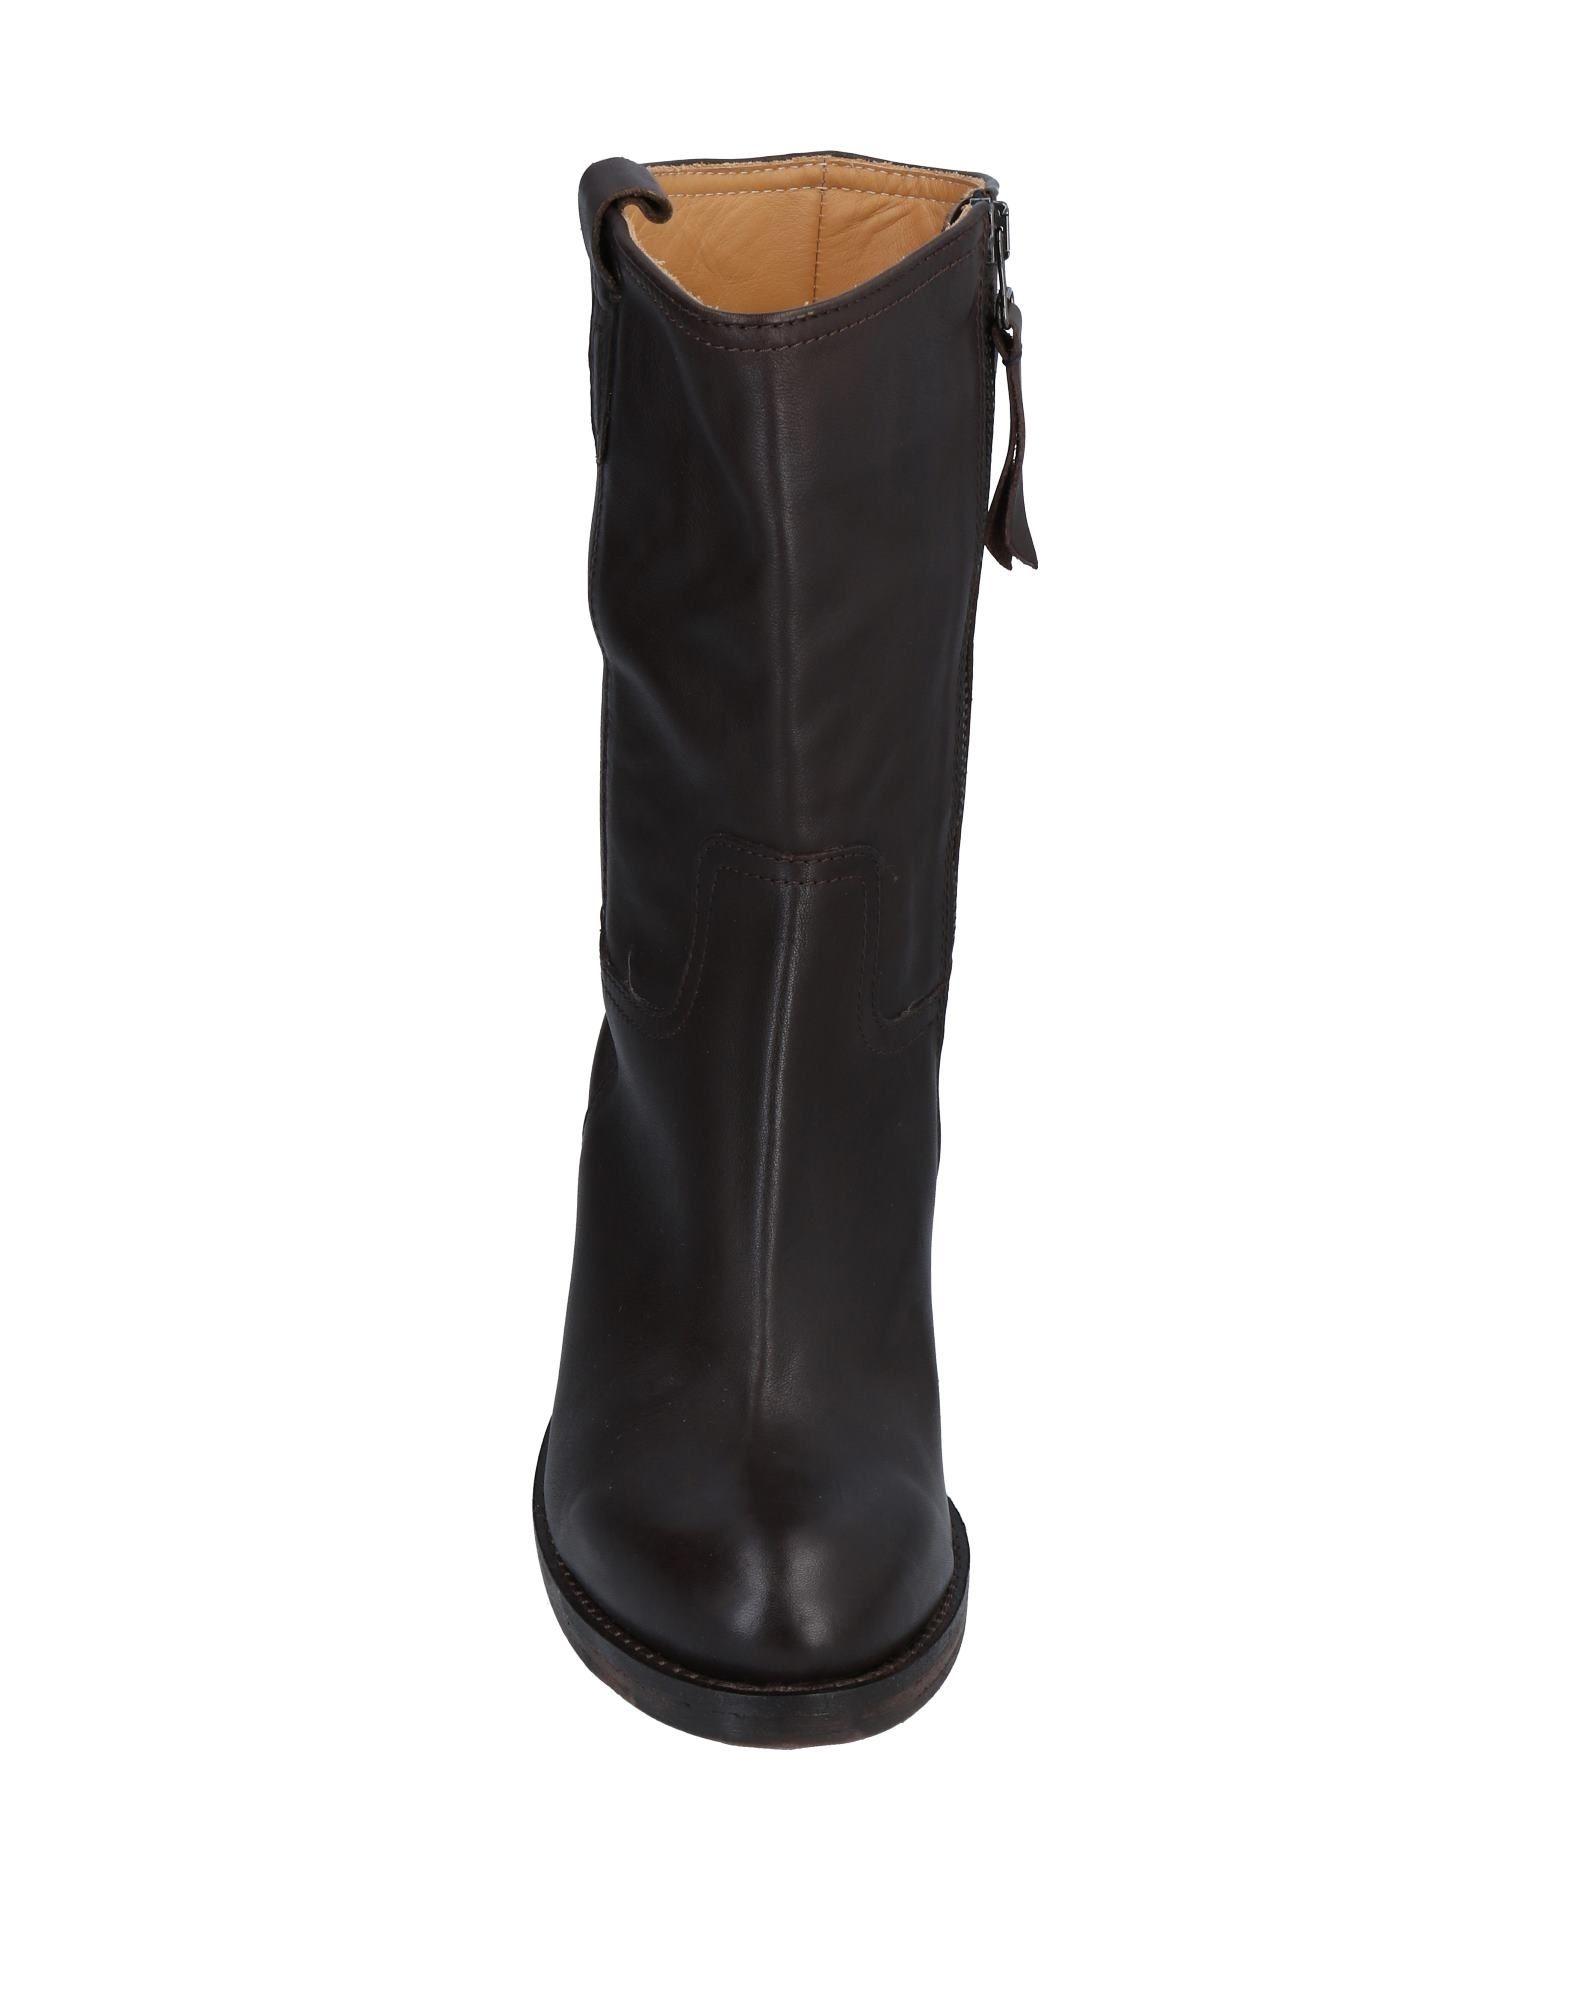 Stilvolle Stiefelette billige Schuhe El Campero Stiefelette Stilvolle Damen  11543089SF e4eb83